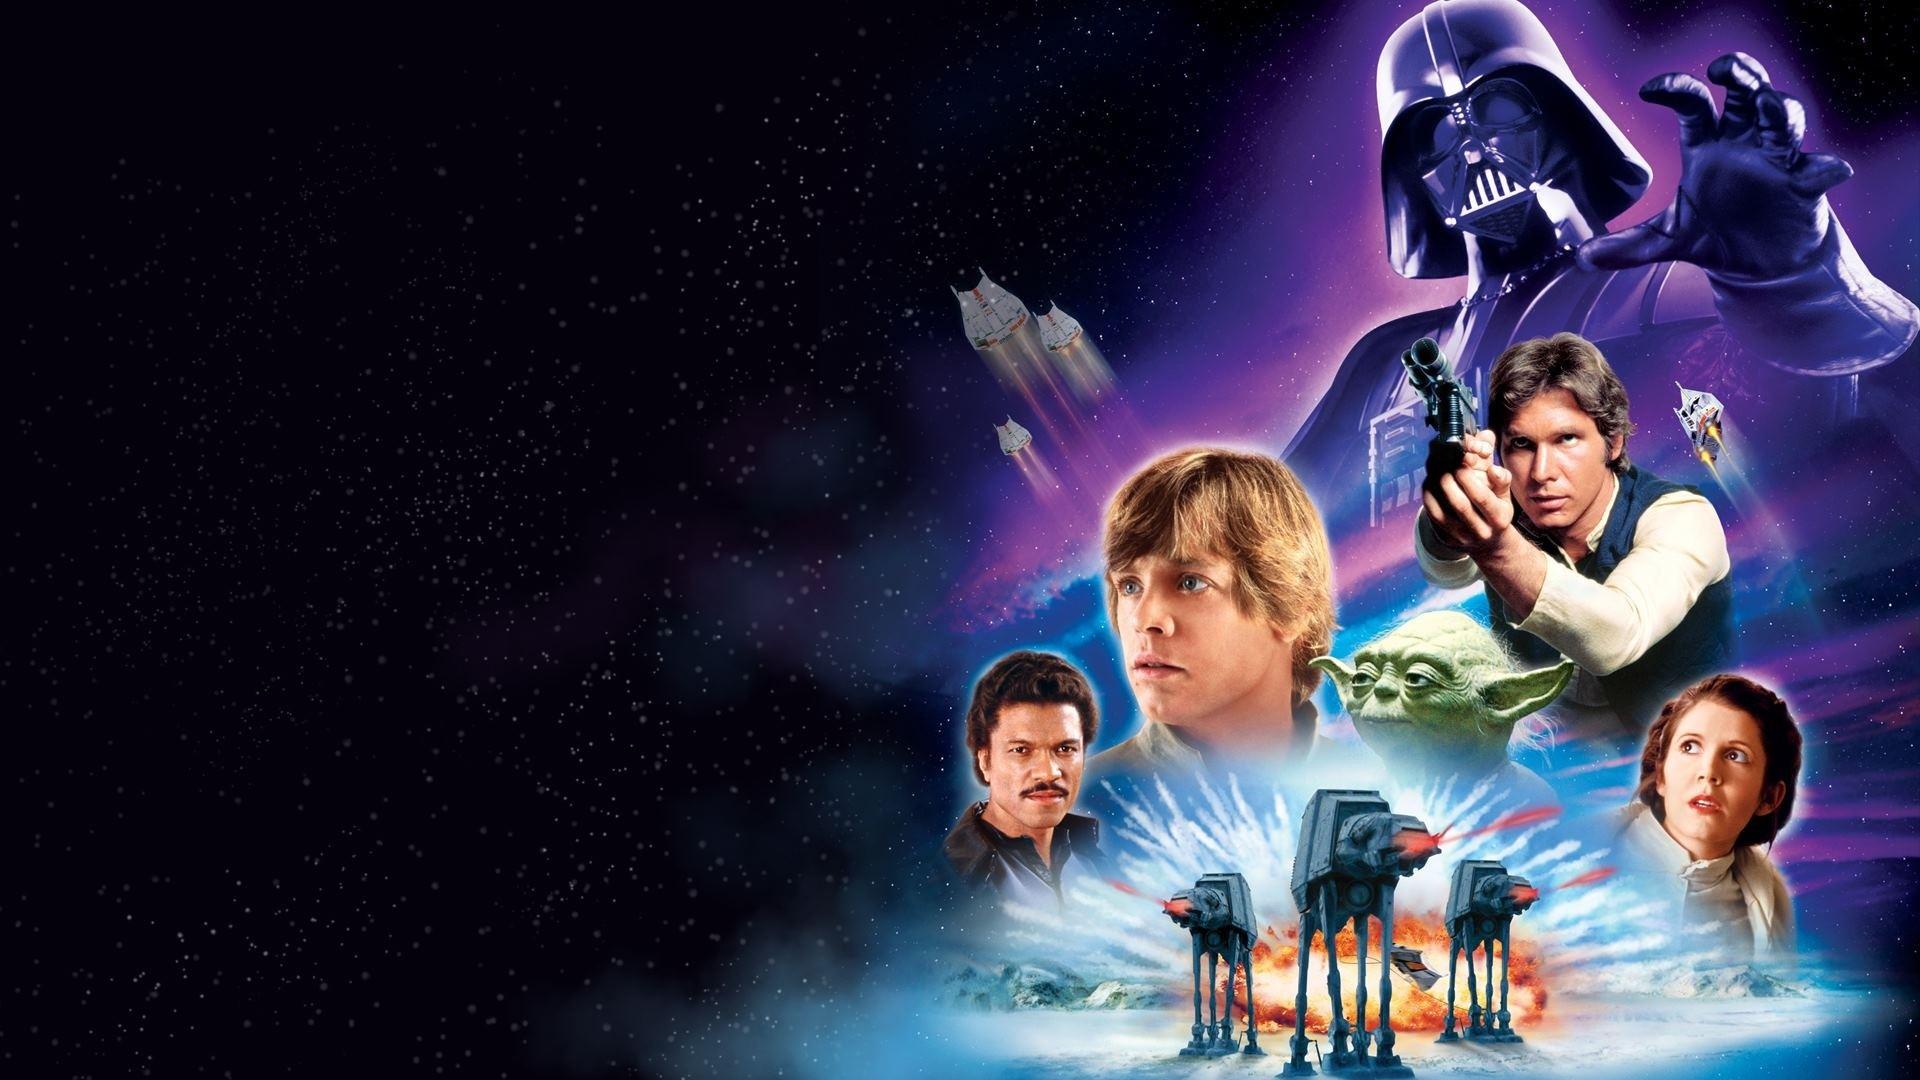 Star Wars Episode V The Empire Strikes Back 1980 Soundtrack 03